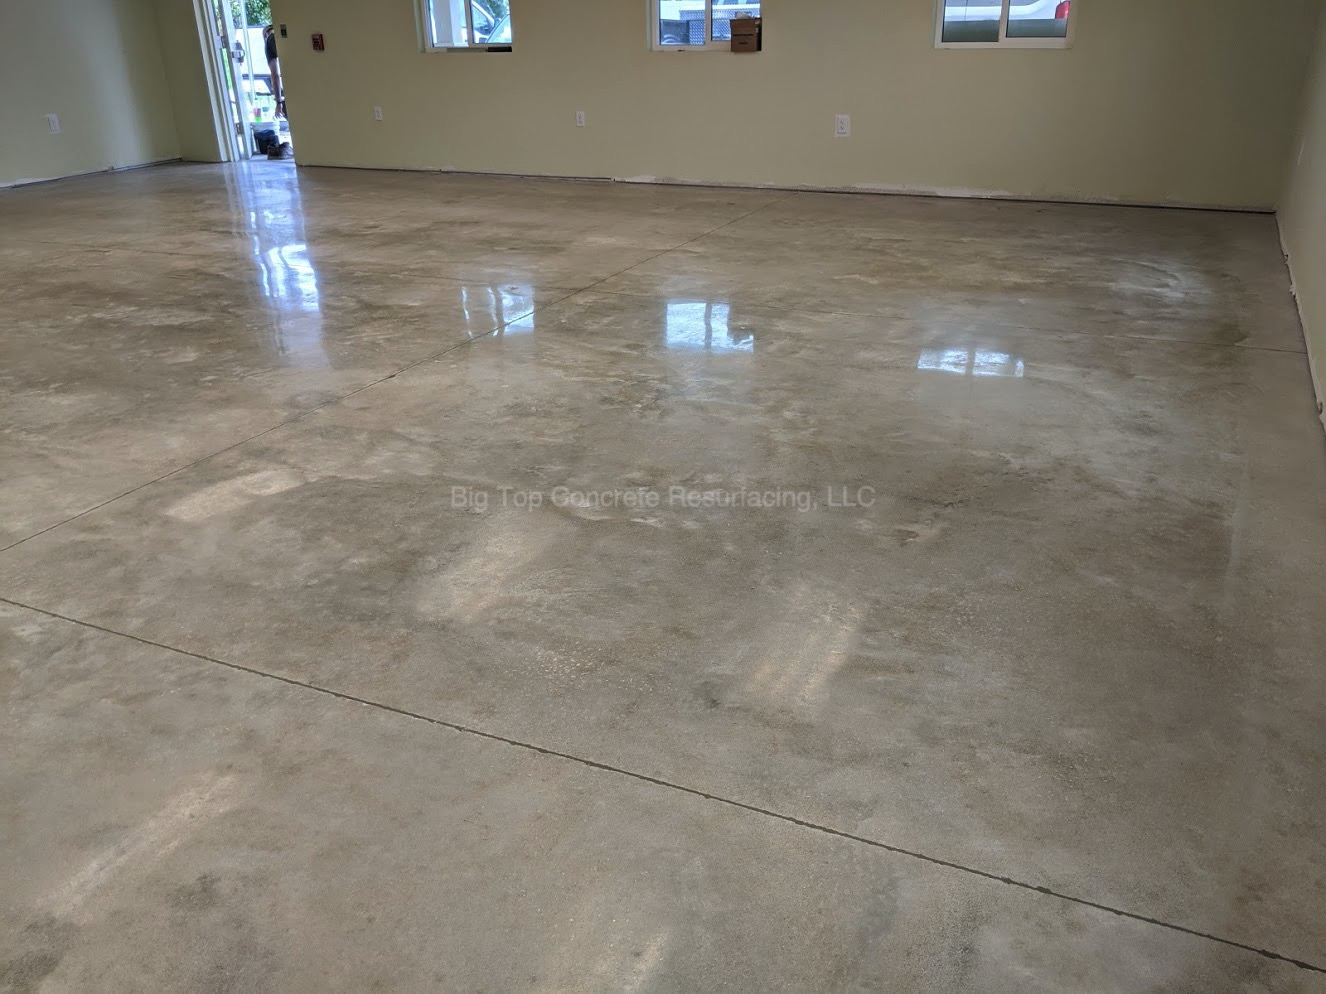 Concrete Polishing Contractor Orlando